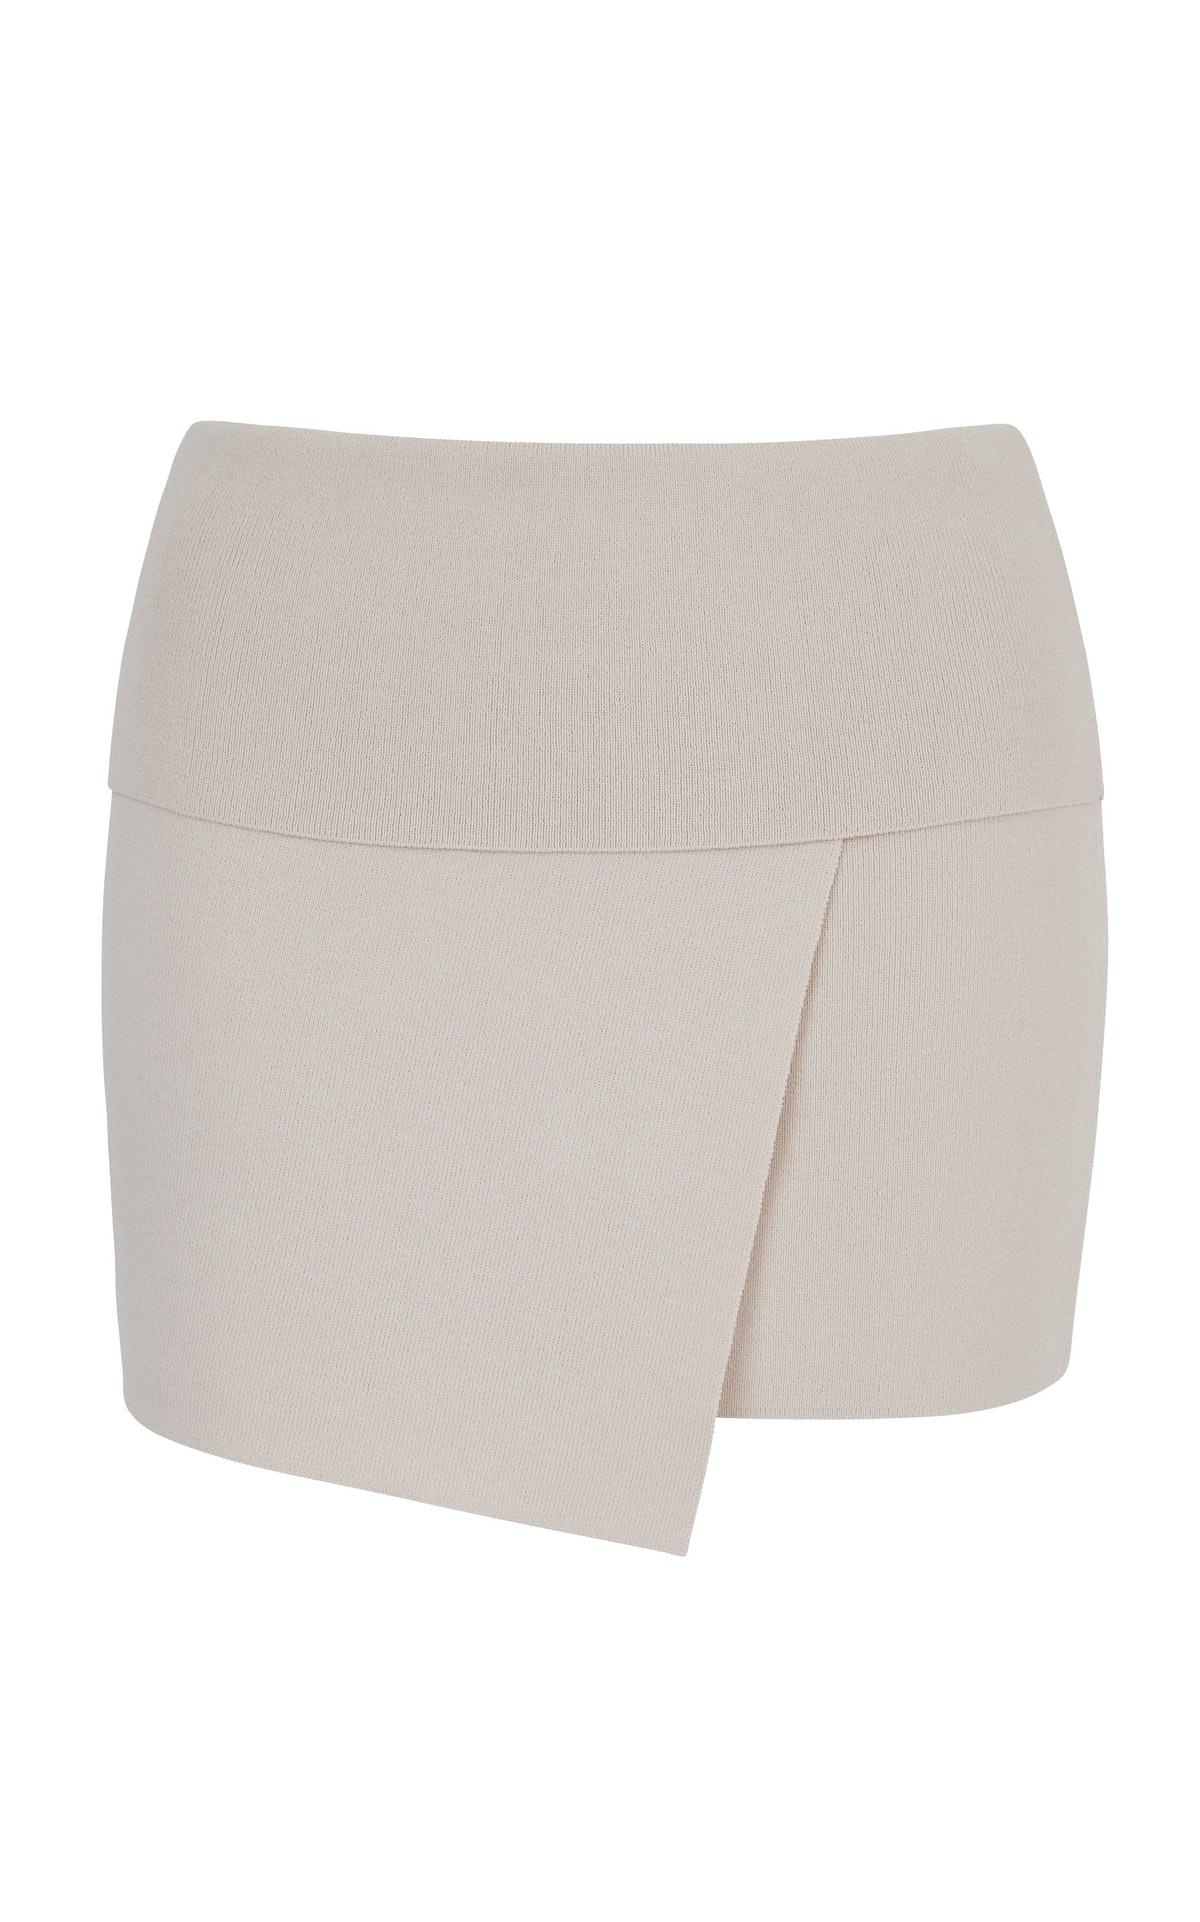 Takara crepe wrap beige mini skirt from Aya Muse.